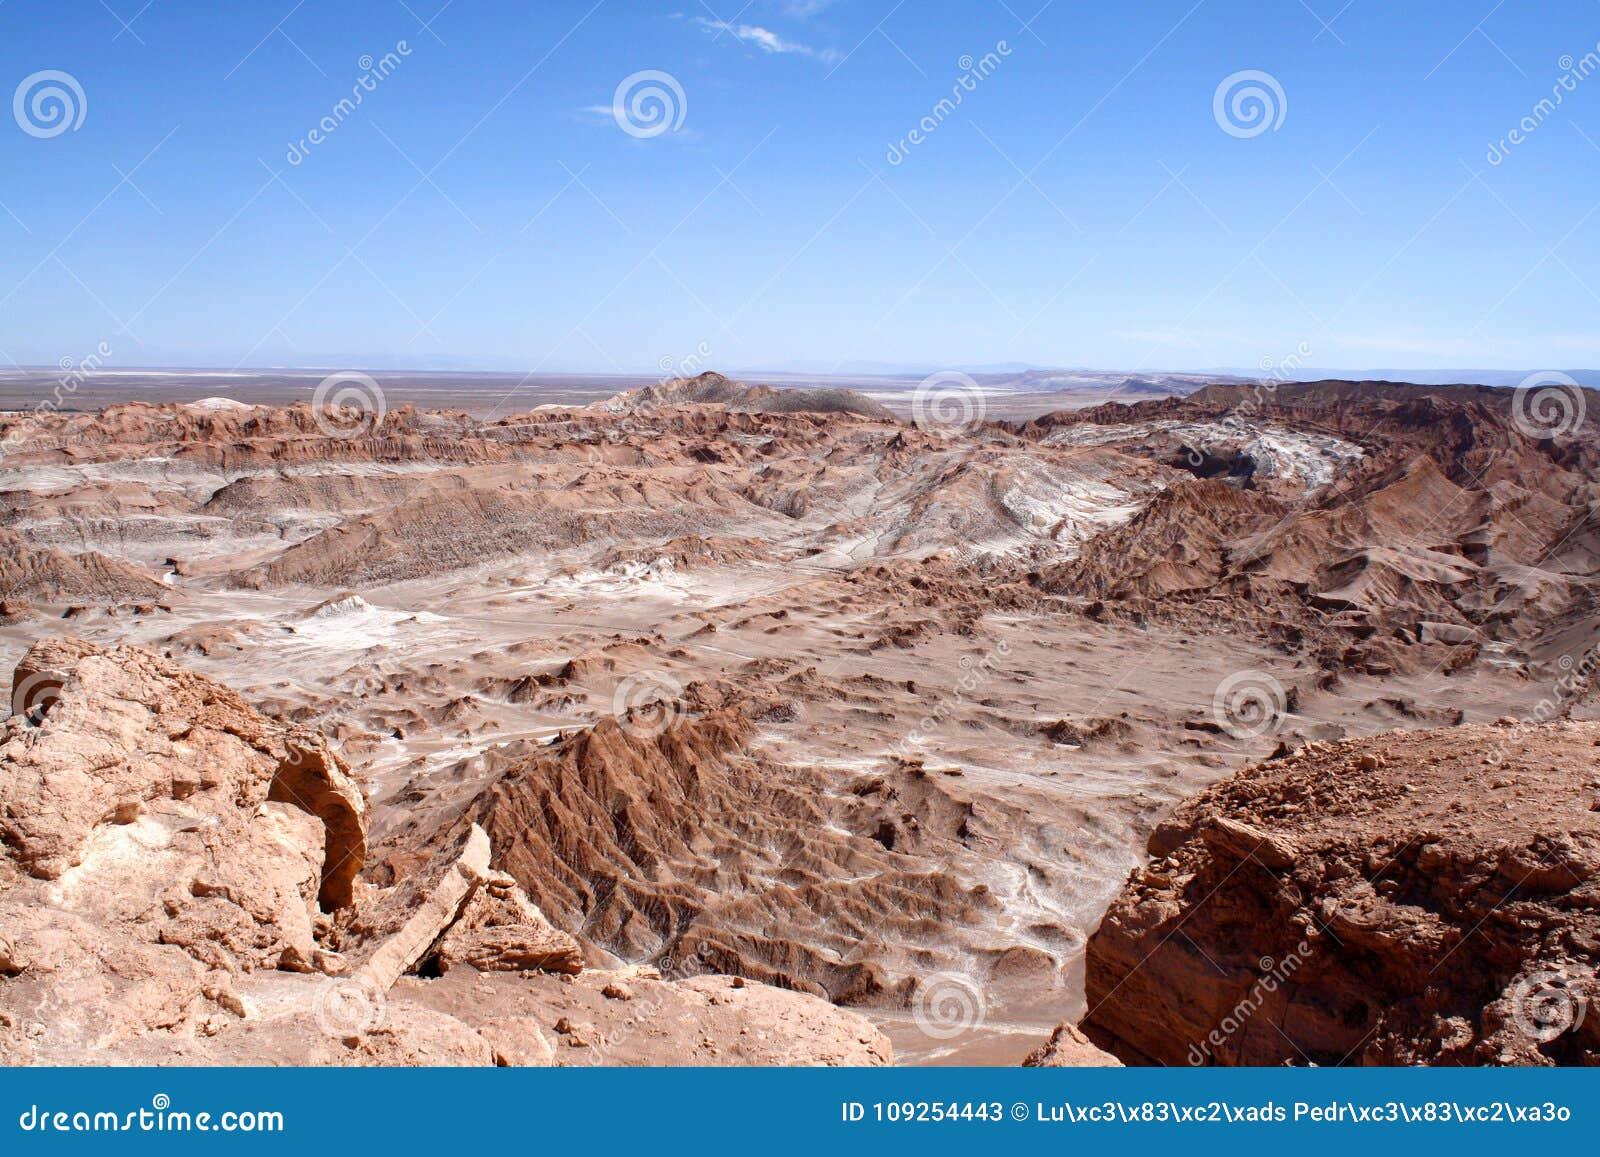 Chile Atacama Desert Death Valley X28 Valle De La Muerte X29